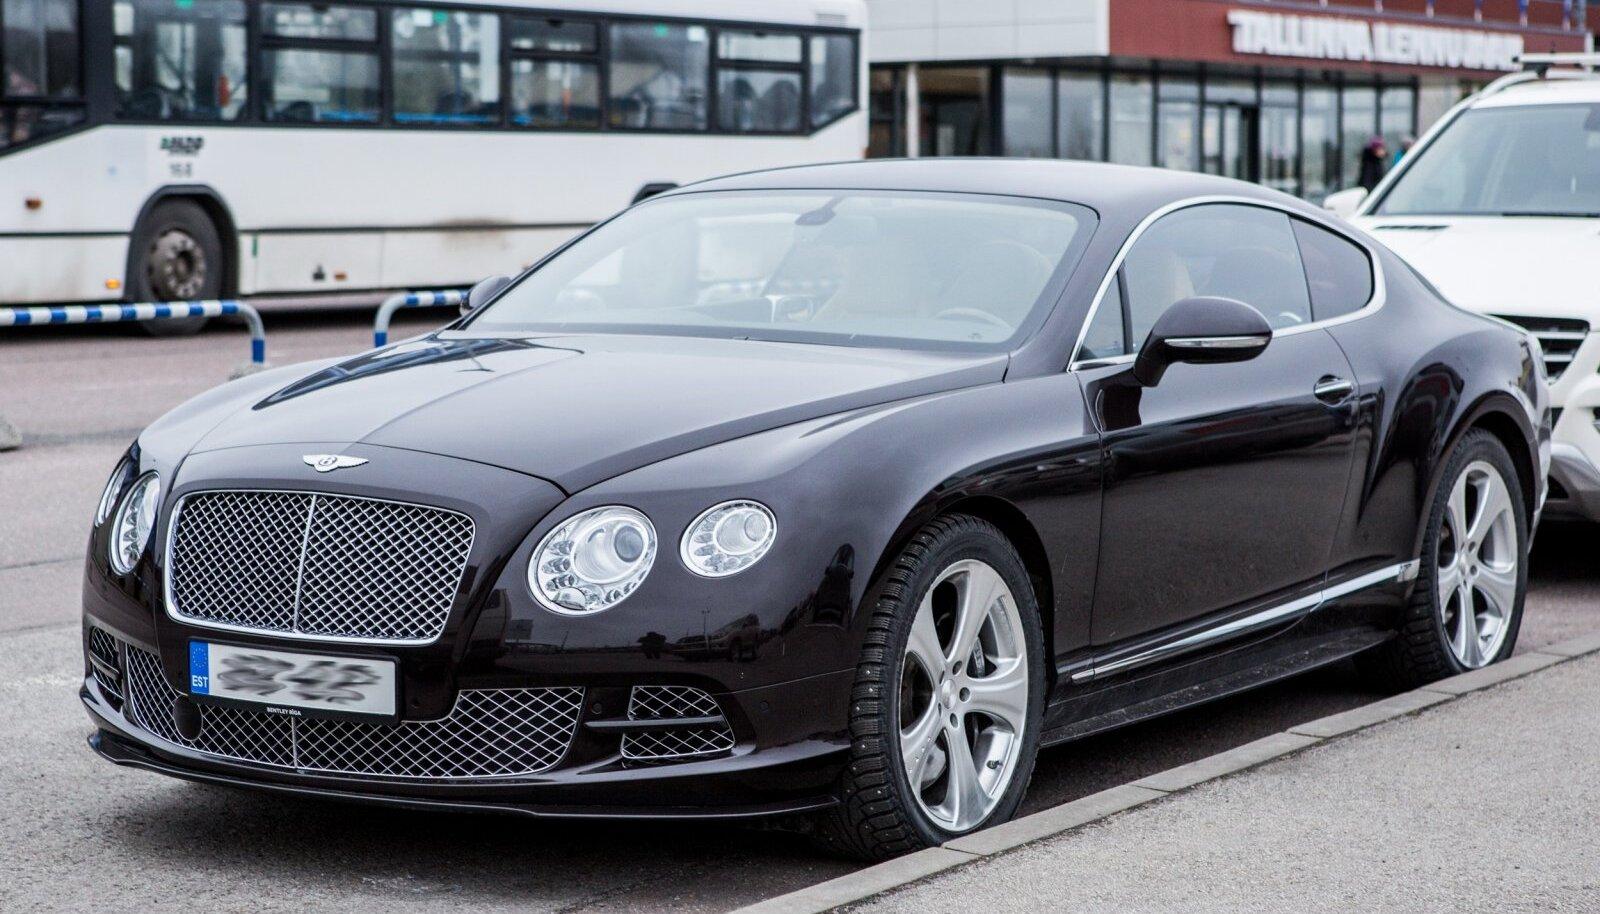 150 000 eurot maksev Bentley Continental GT aastal 2014 Tallinna lennujaama ees, foto on illustratiivne.